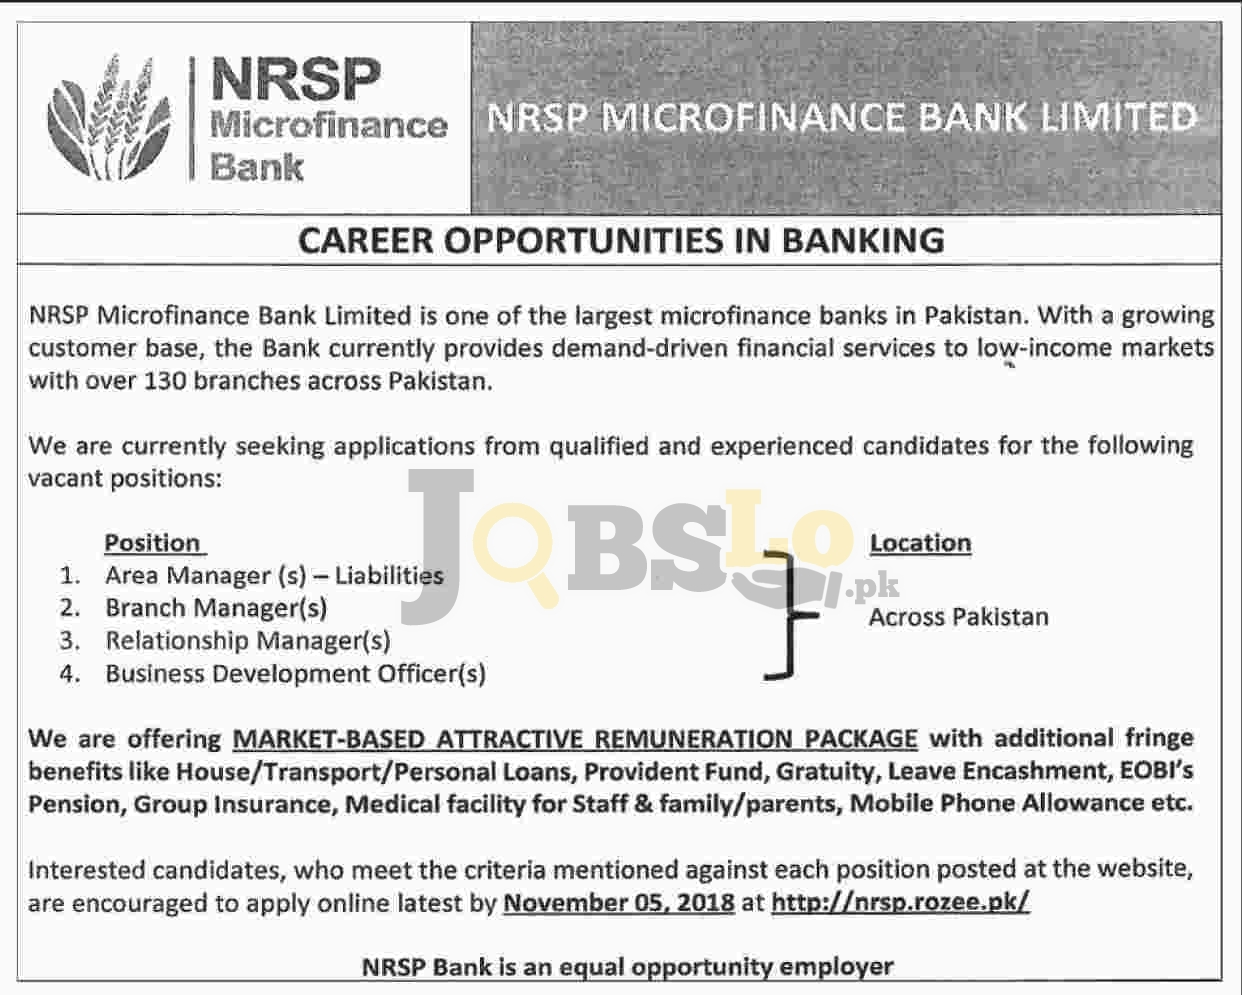 NRSP Microfinance Bank Jobs 2018 Apply Online Last Date Current Opportunities